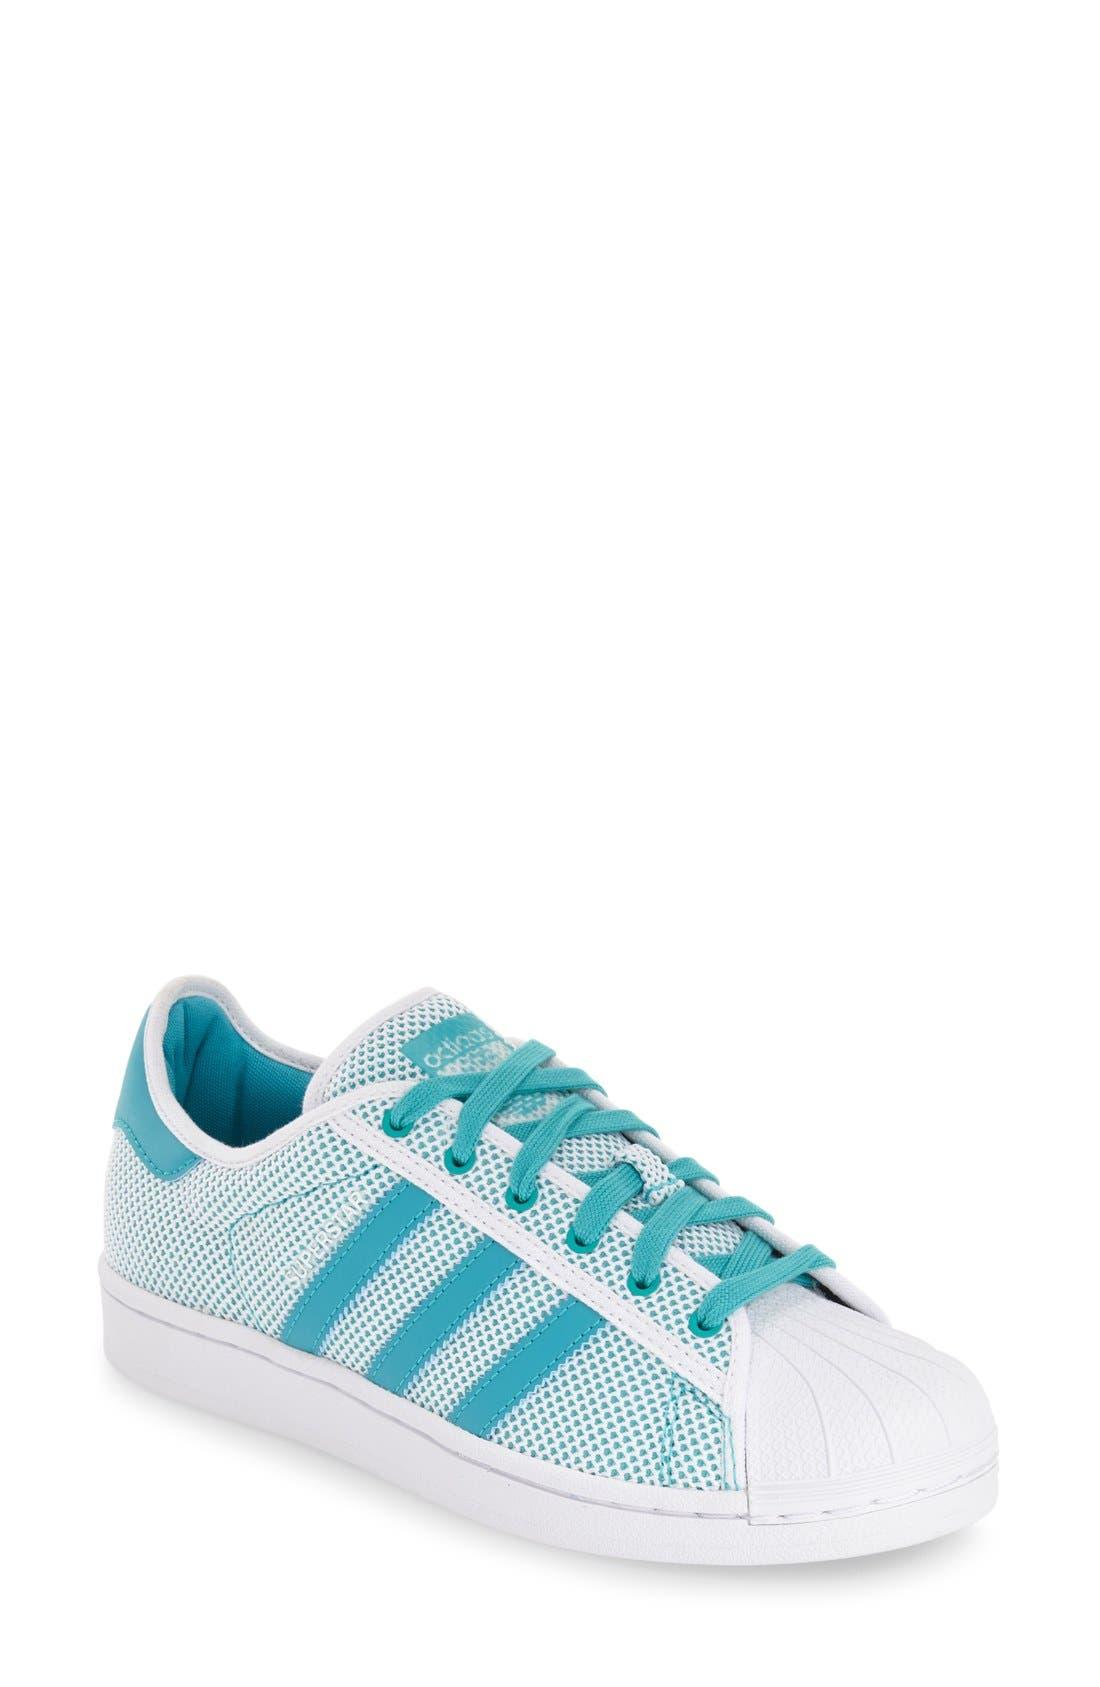 Main Image - adidas 'Superstar ADICOLOR' Sneaker (Women)